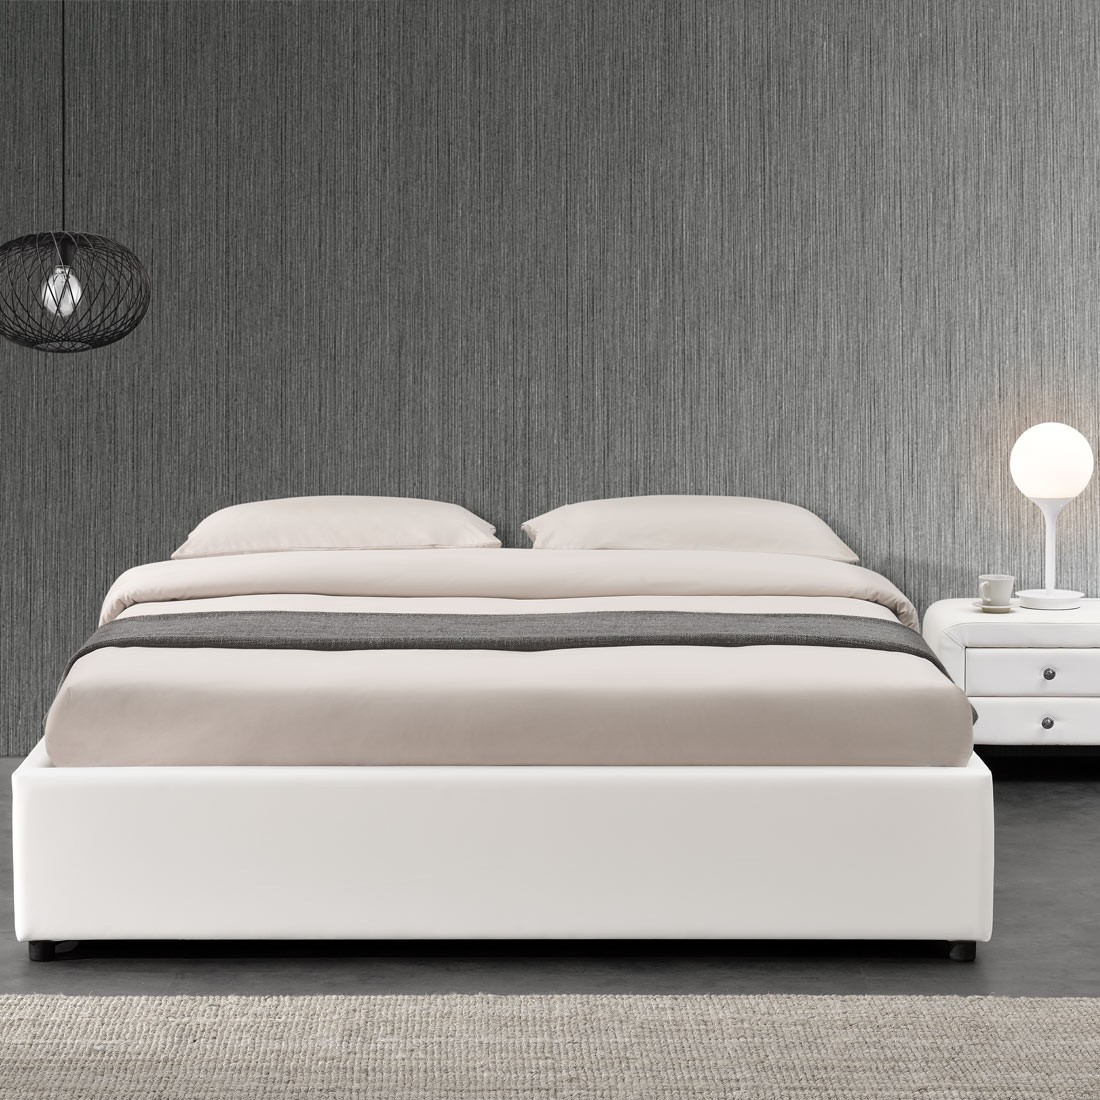 ensemble matelas sommier coffre 140 blanc. Black Bedroom Furniture Sets. Home Design Ideas